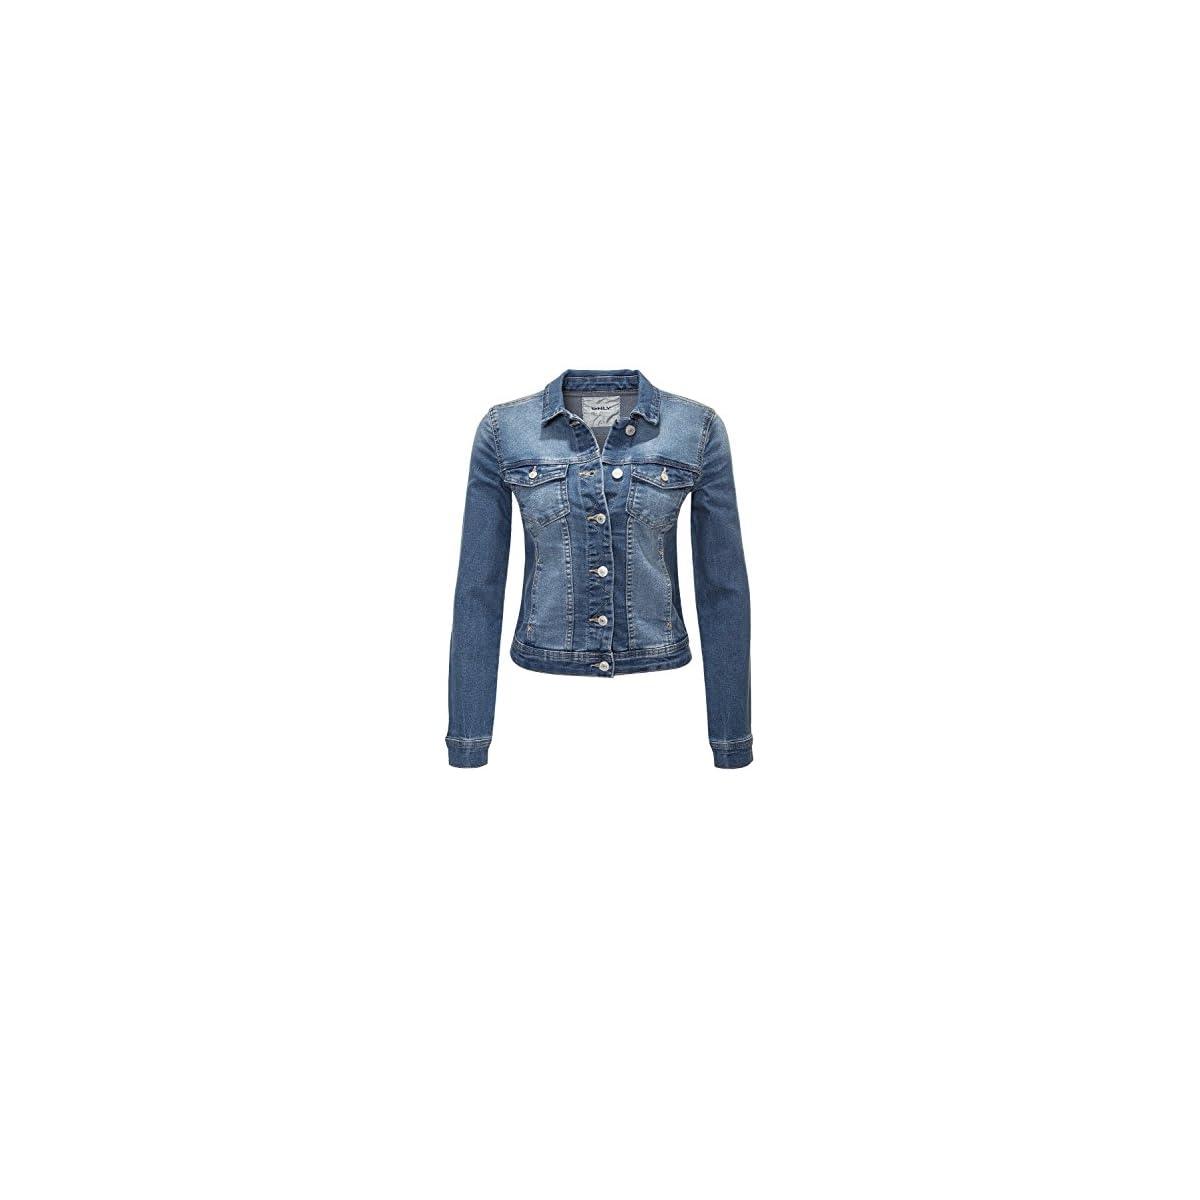 ONLY Damen Jeansjacke Übergangsjacke Leichte Jacke Denim Casual Medium Blue Denim